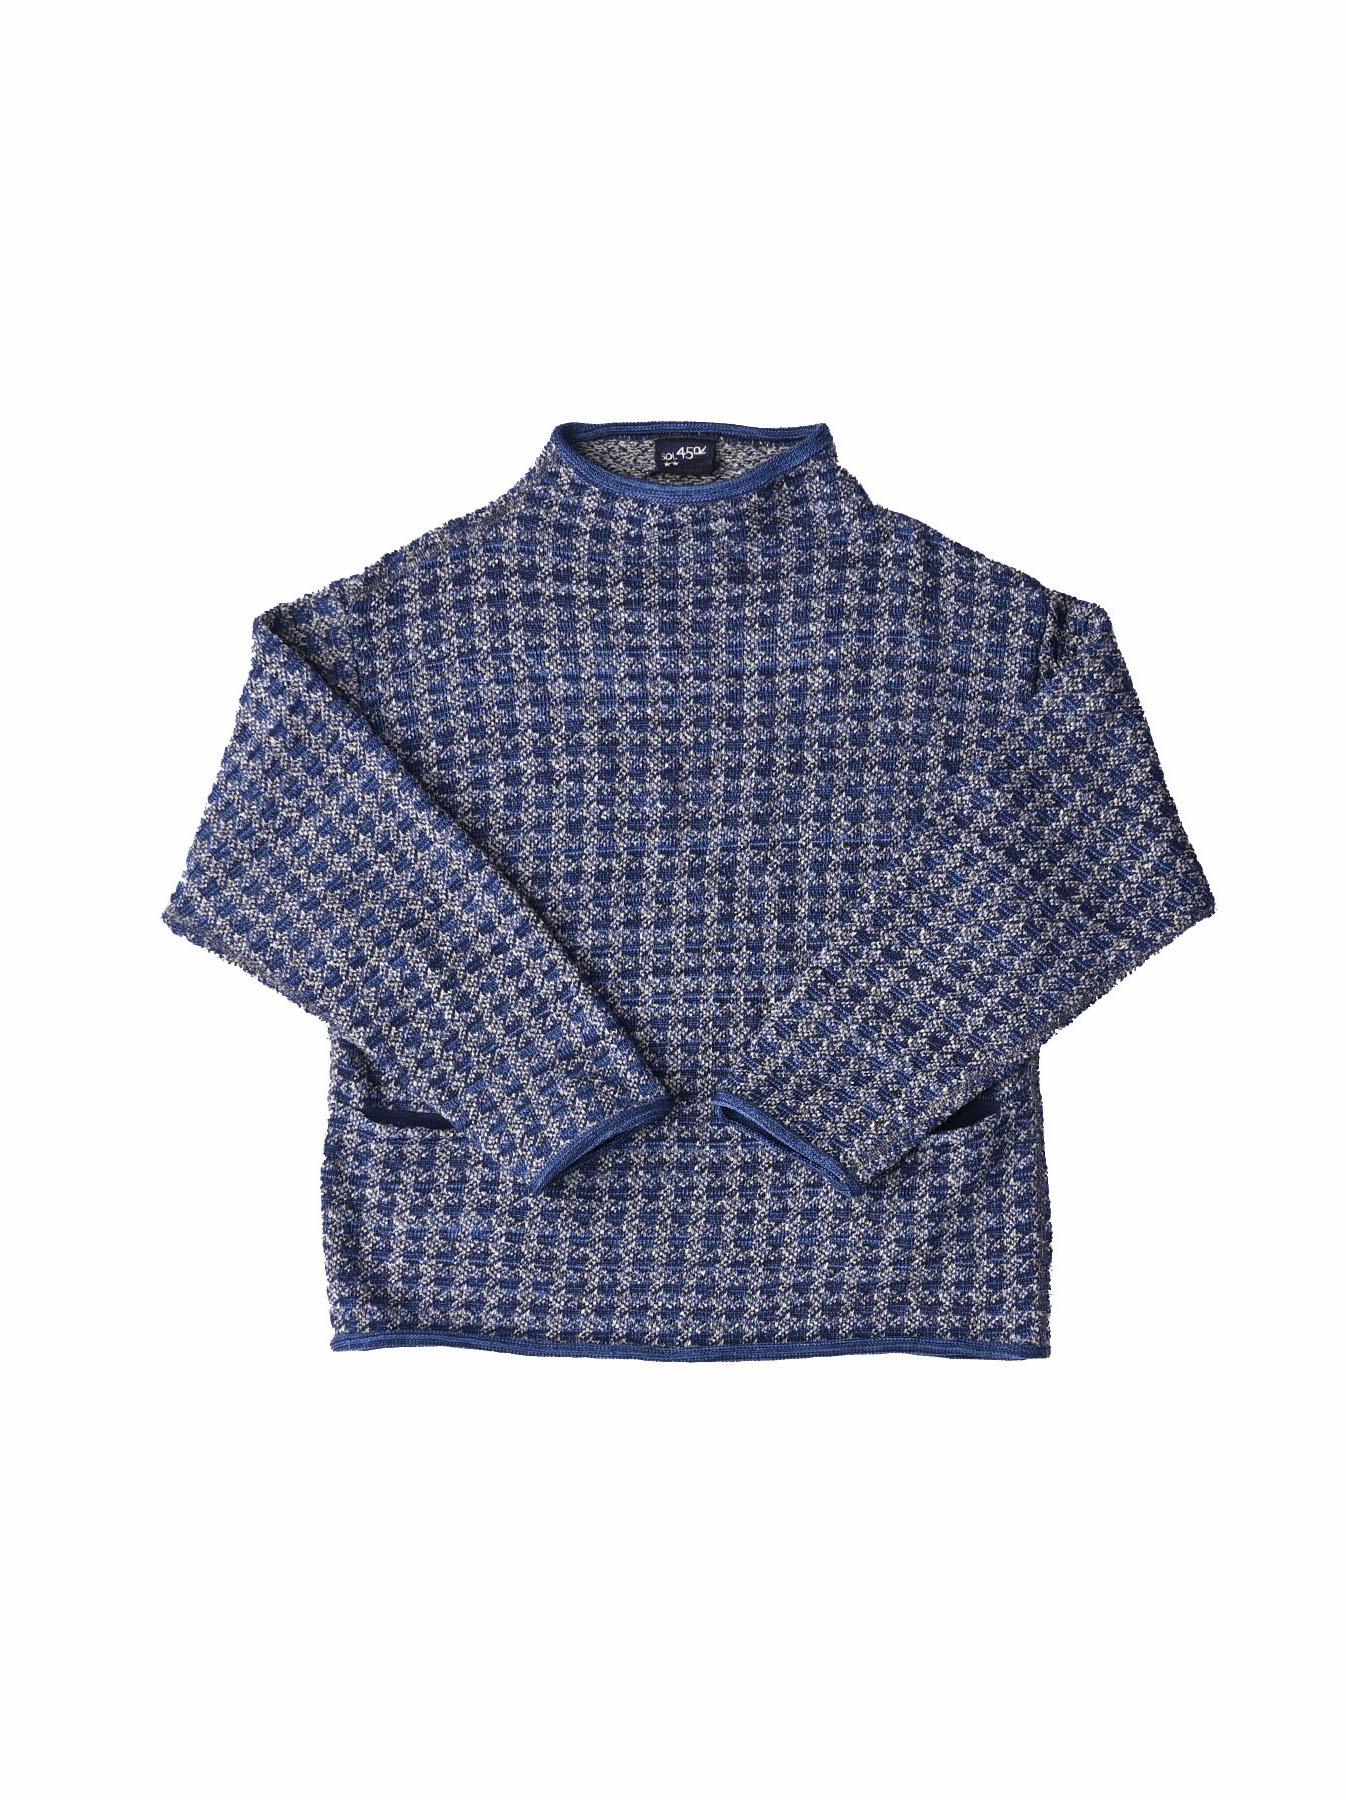 Indigo Knit Jacquard 908 Umahiko Sweater-1